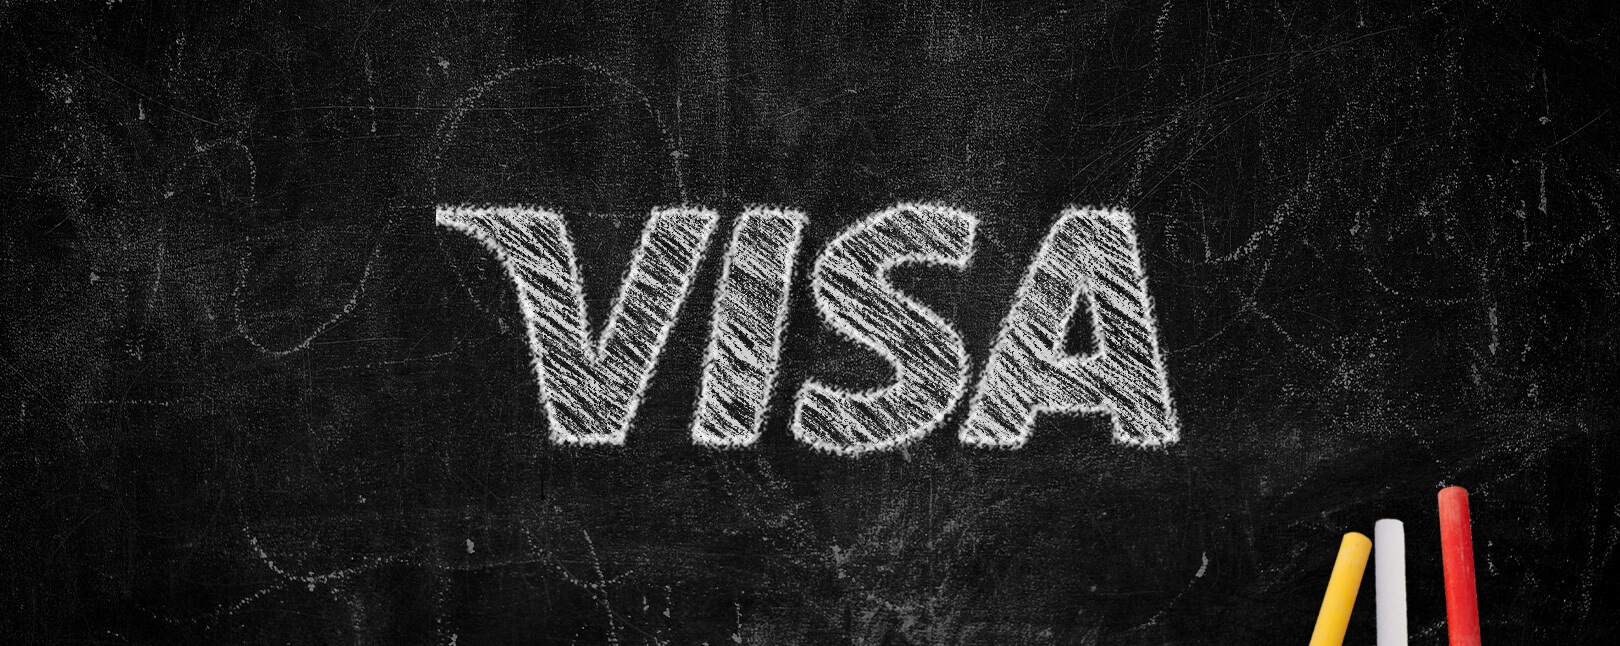 Visa chargeback rules